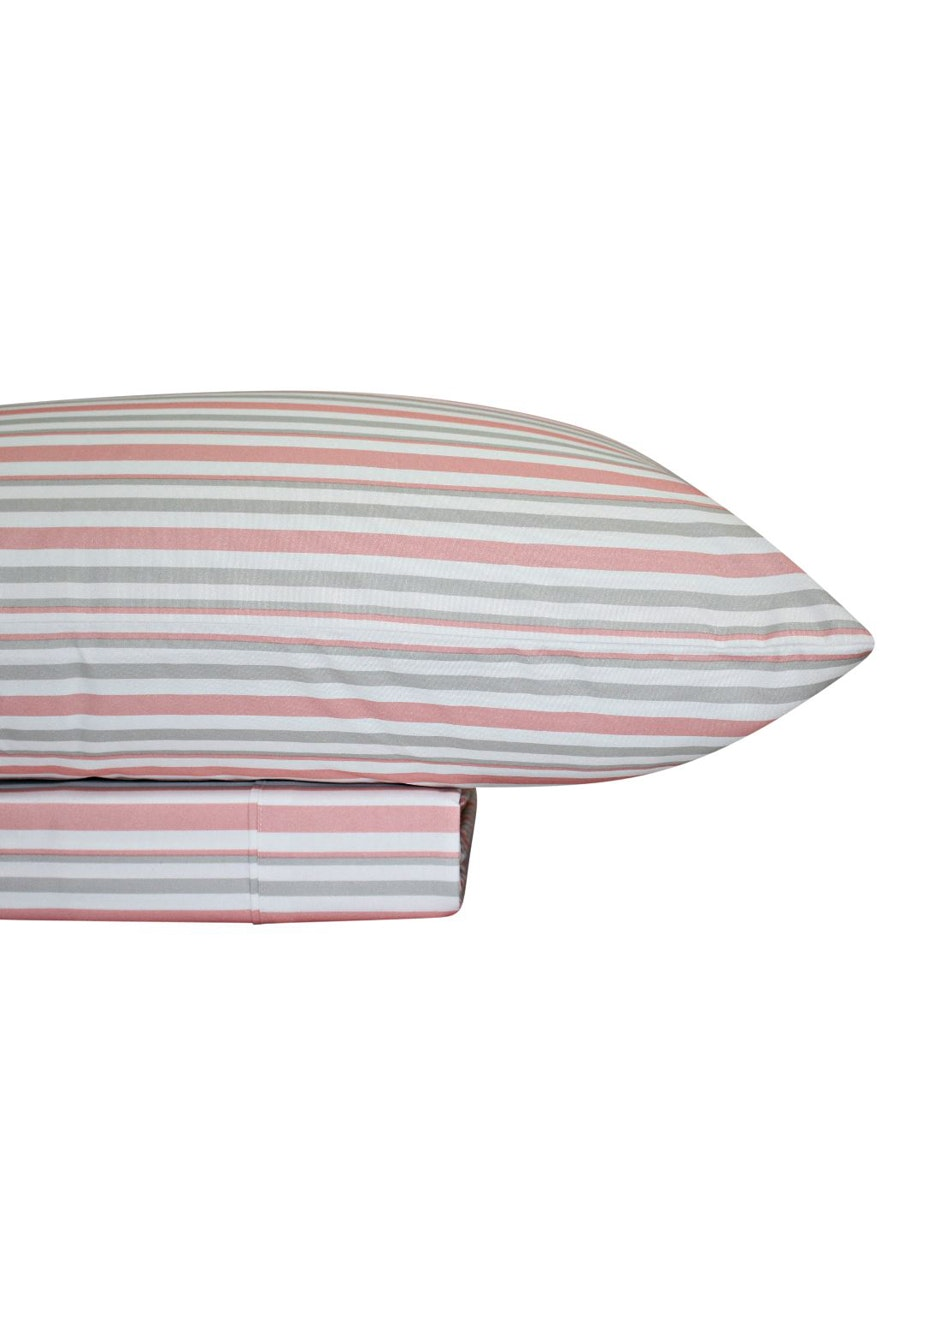 Thermal Flannel Sheet Sets - Stripe Design - Blossom/Glacier - Double Bed